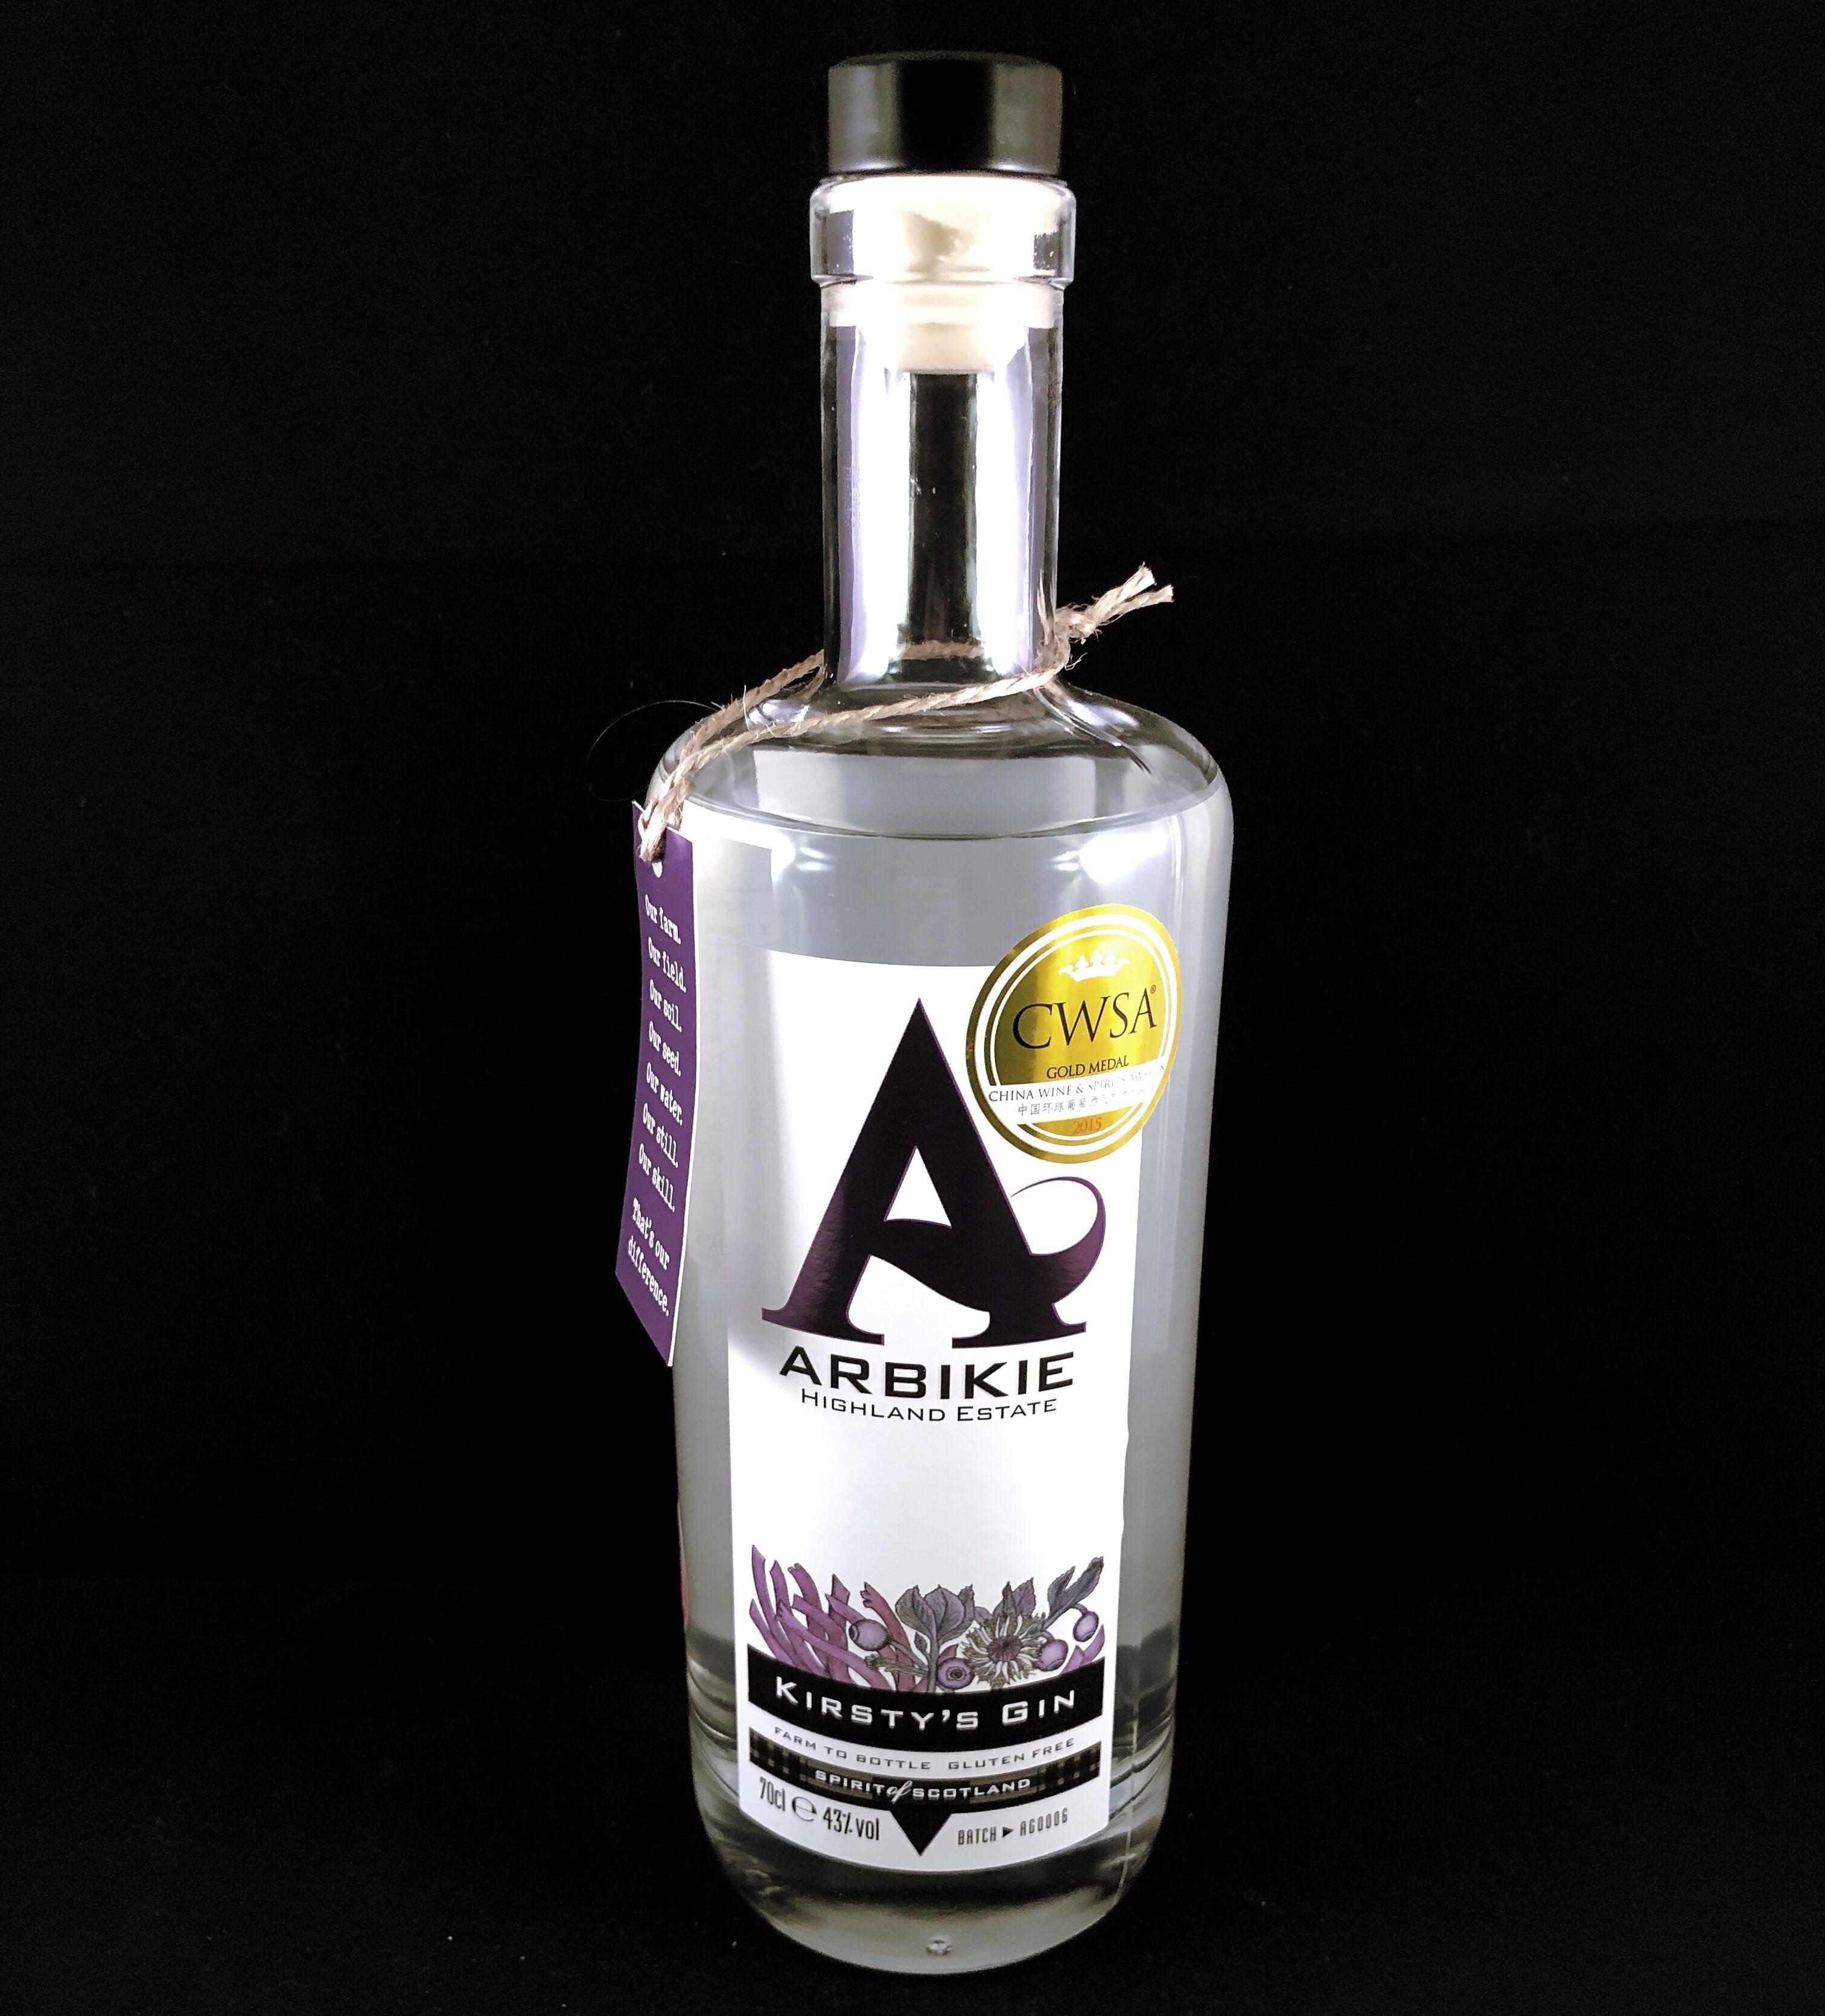 Gin Review – Arbikie Gin #ScottishGin